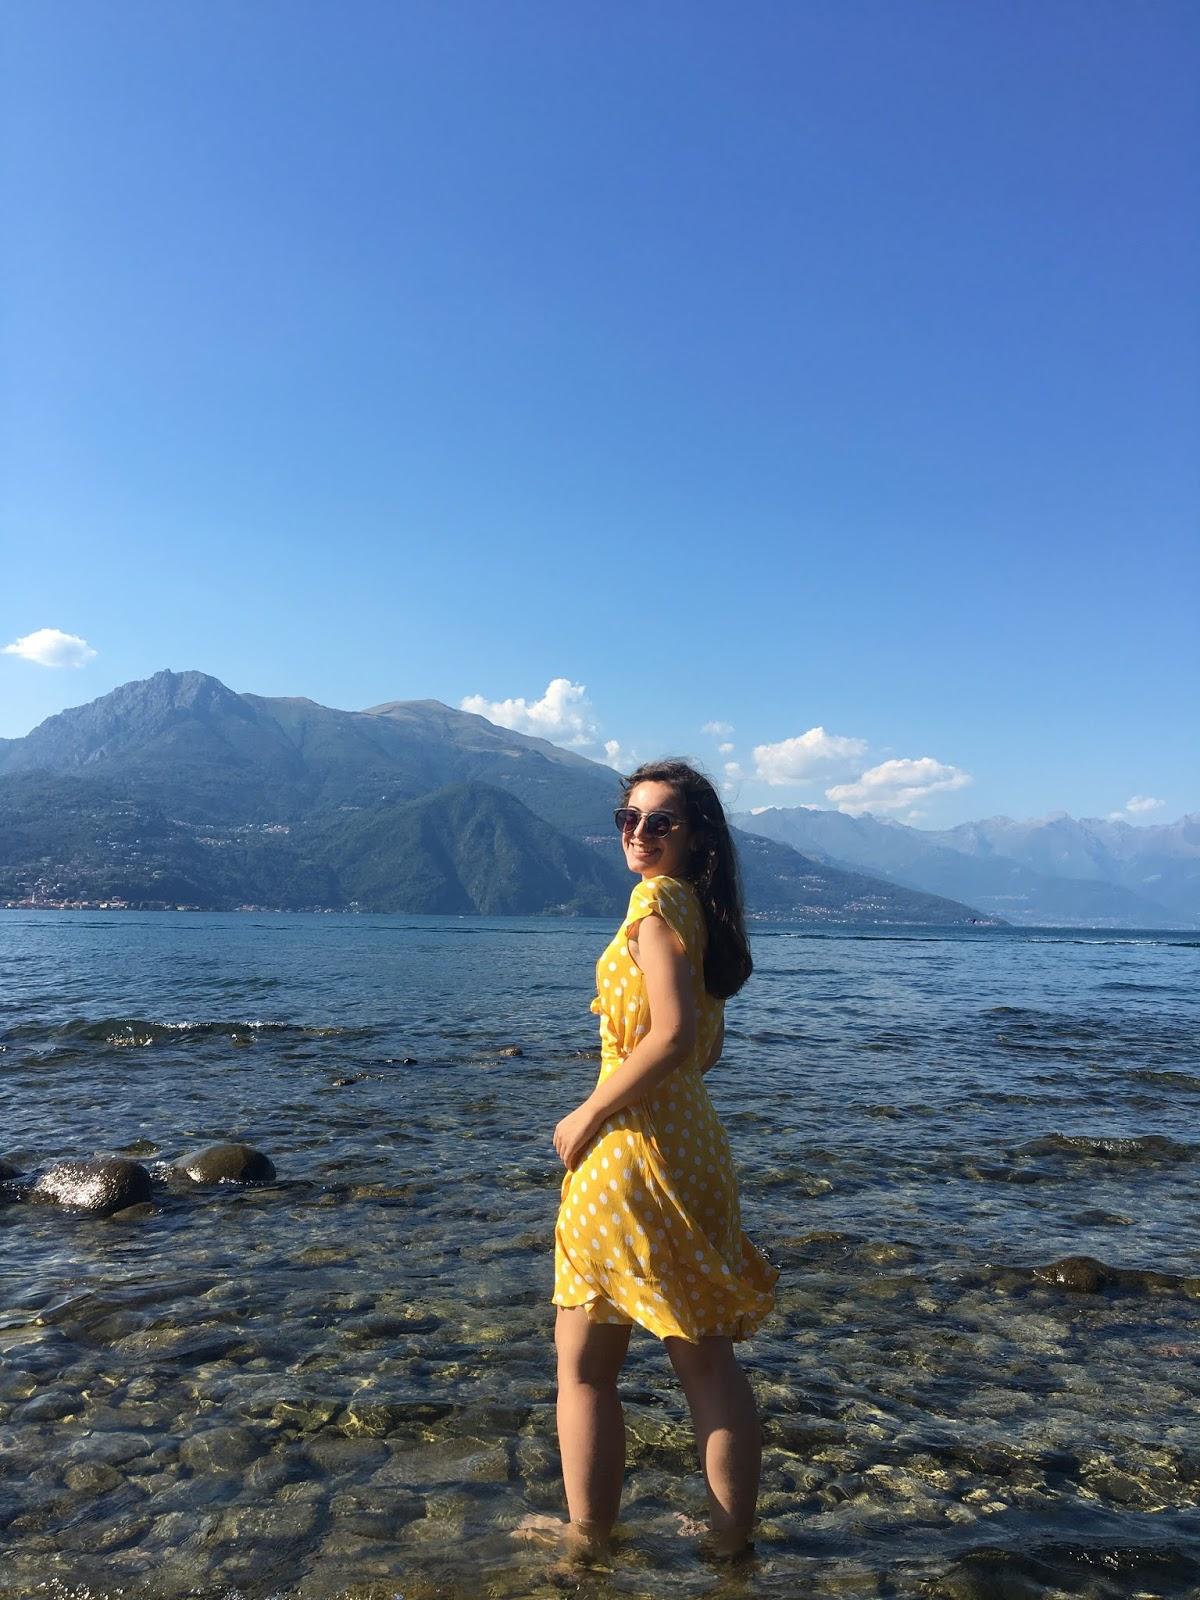 A Day at Lake Como